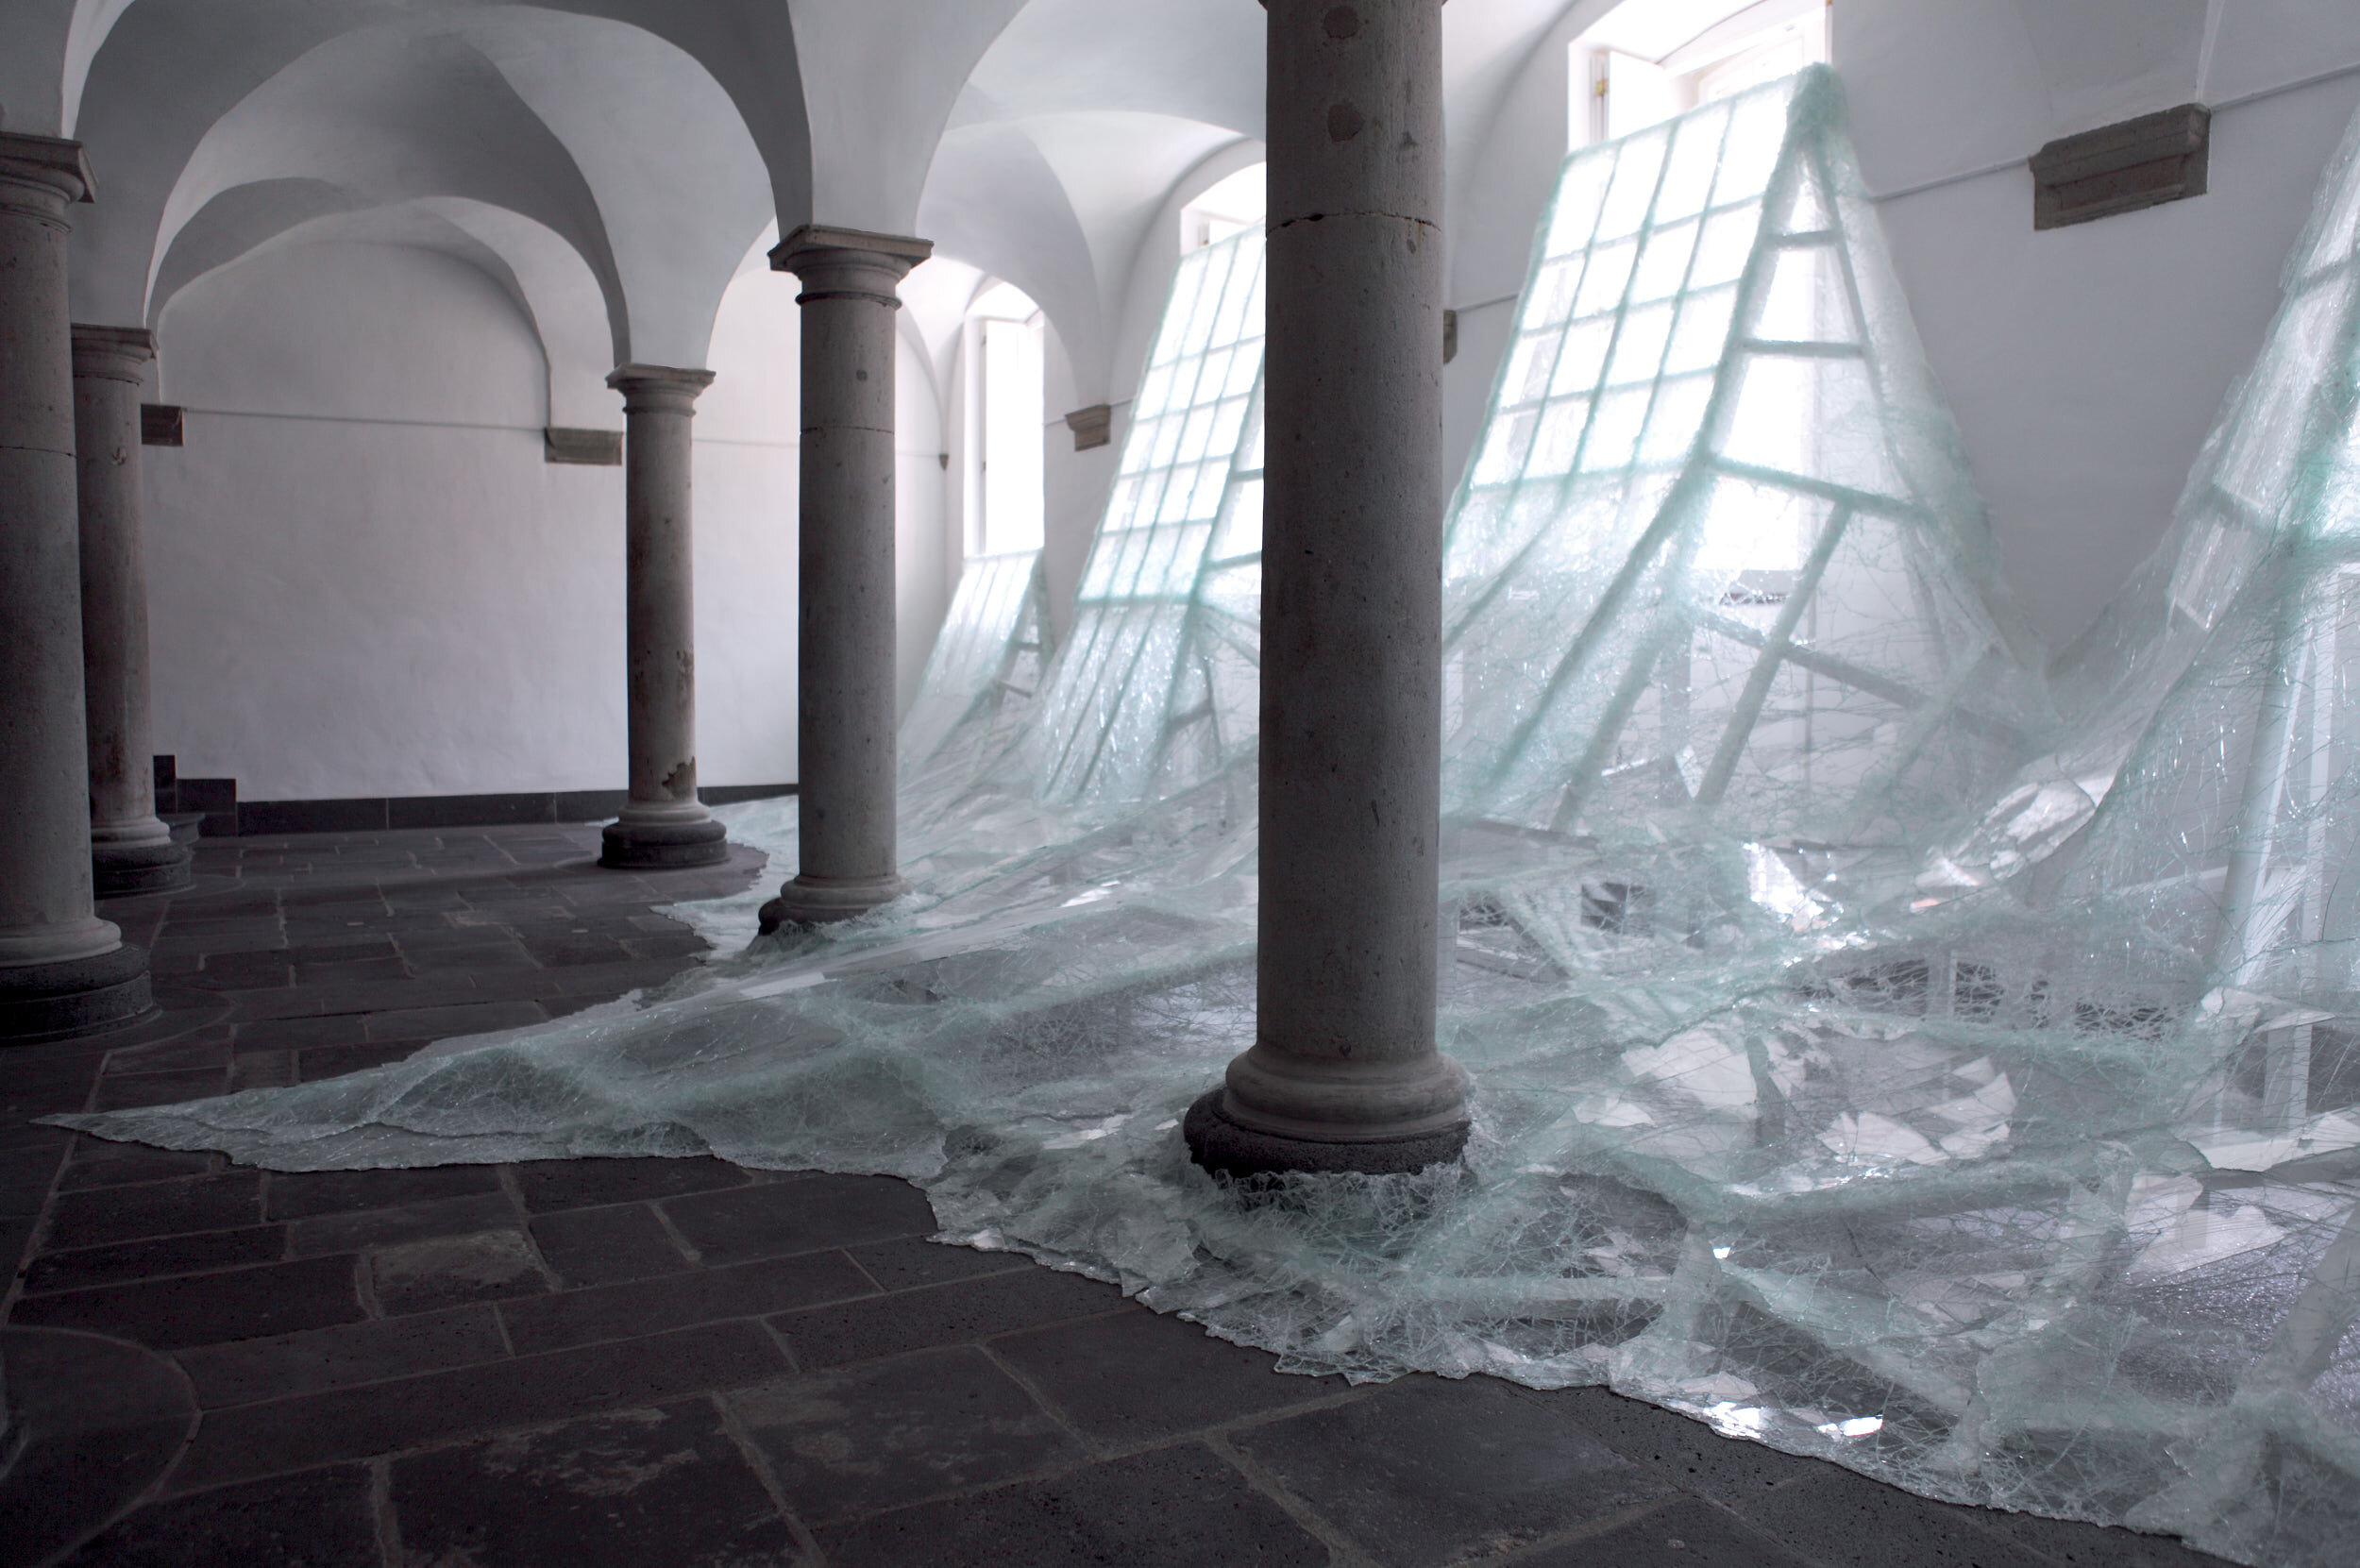 Aérial — Courtesy Krupic Kersting Gallery, Cologne